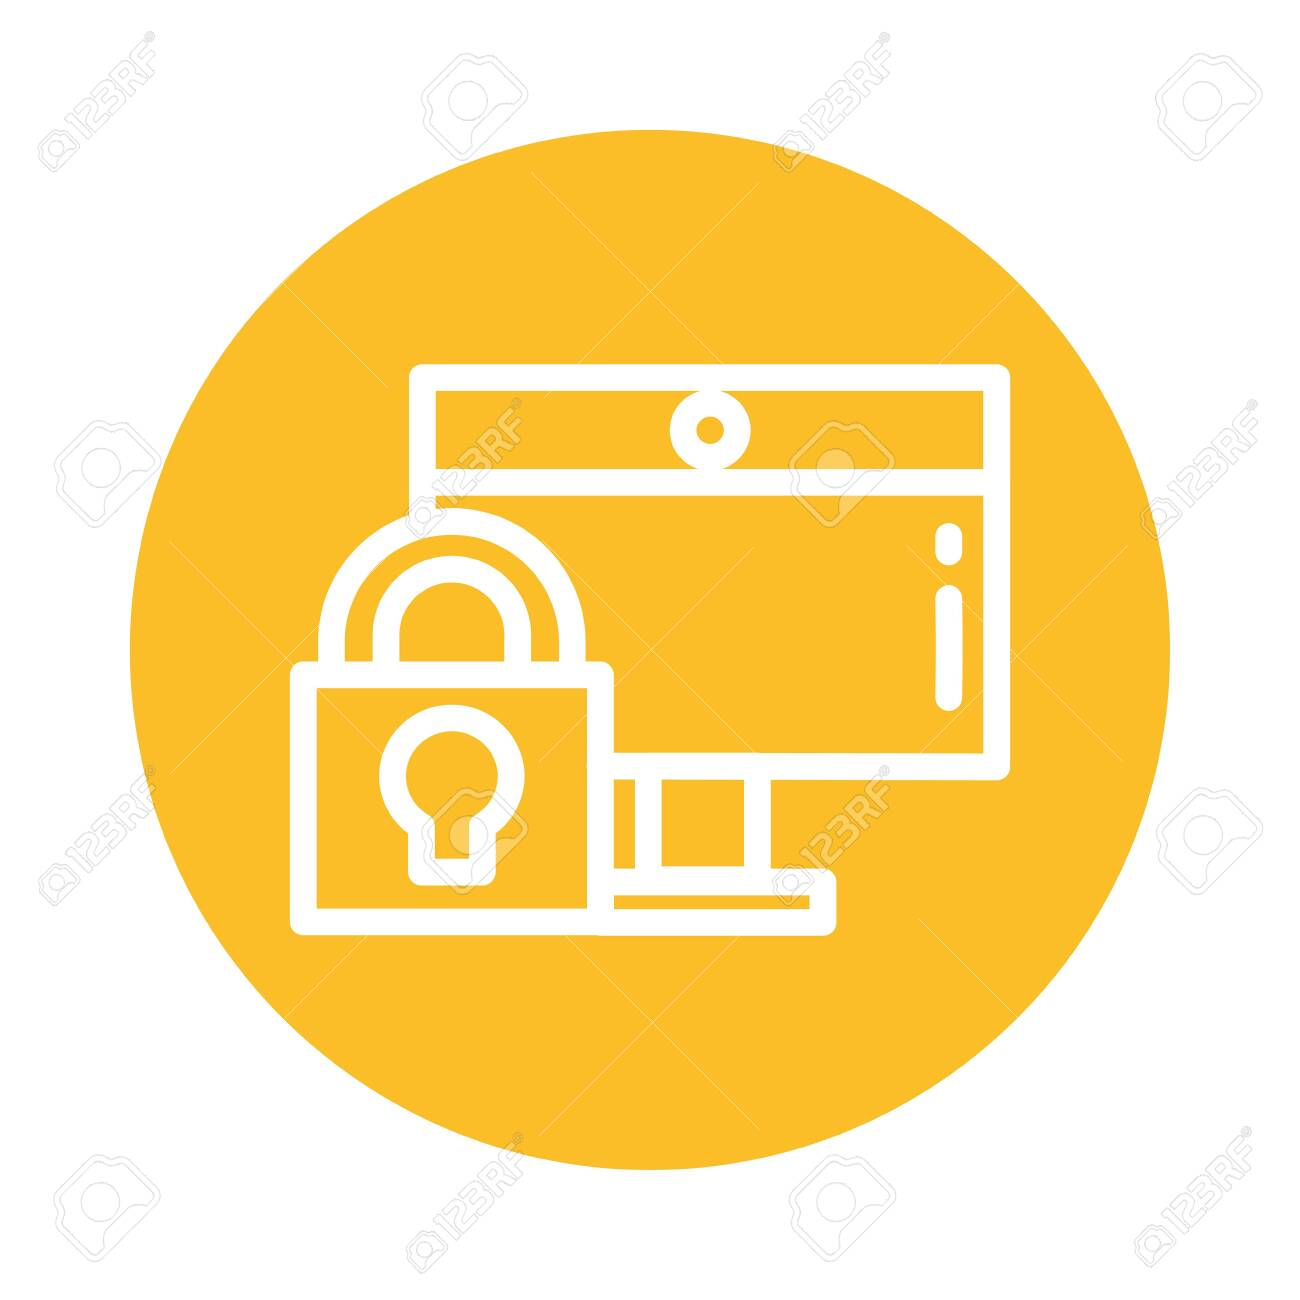 padlocked screen, block and flat style icon vector illustration design - 148537026